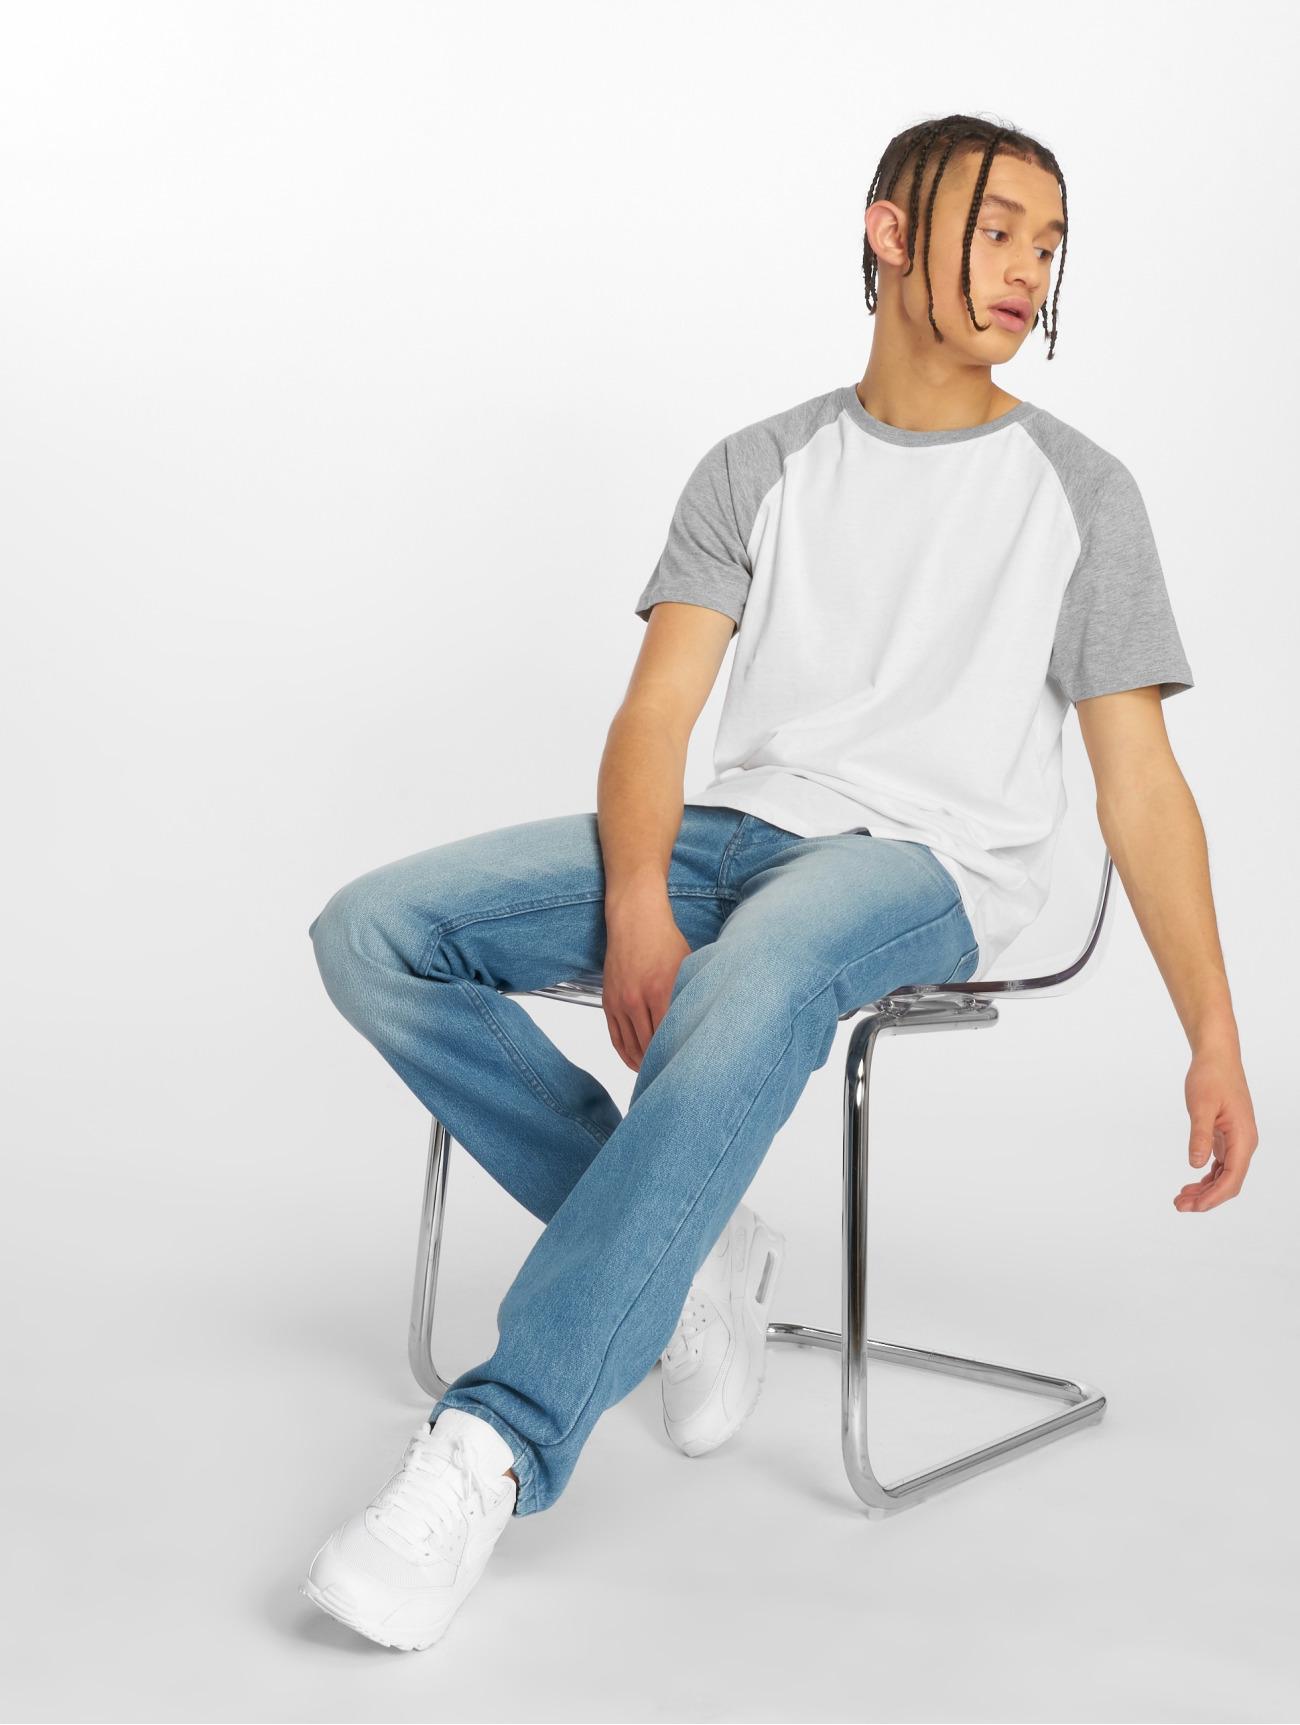 Rocawear Moletro Leather Patch bleu Homme Jean coupe droite 476038 Homme Jeans